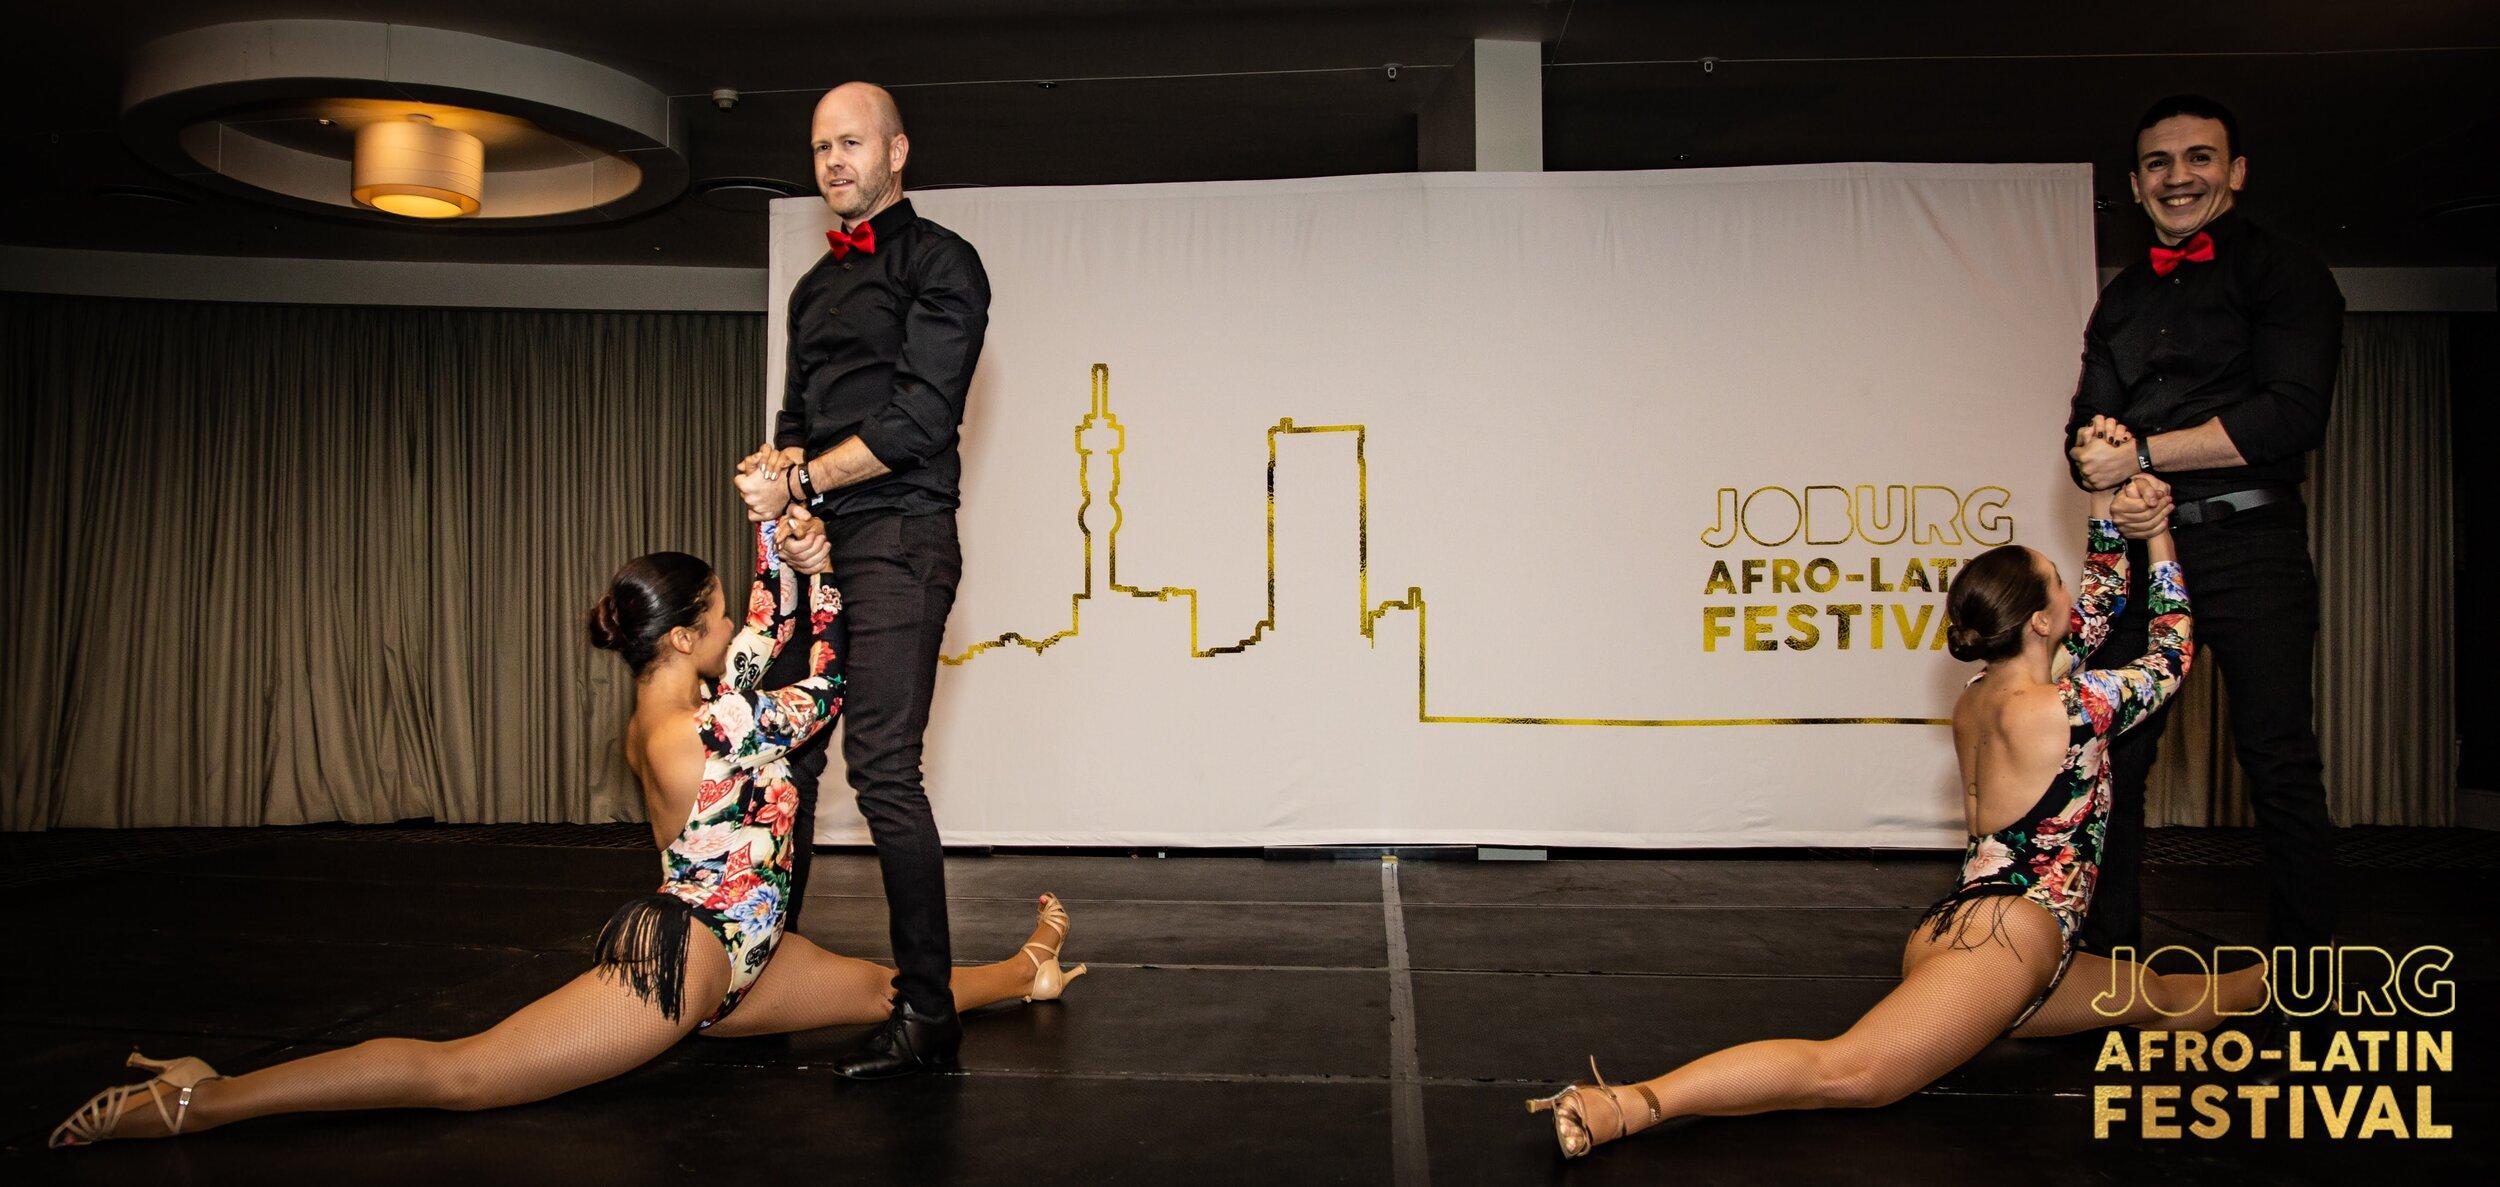 Candela Jozi Mambo - NY Salsa Show at the Johannesburg Afro-Latin Festival 2019